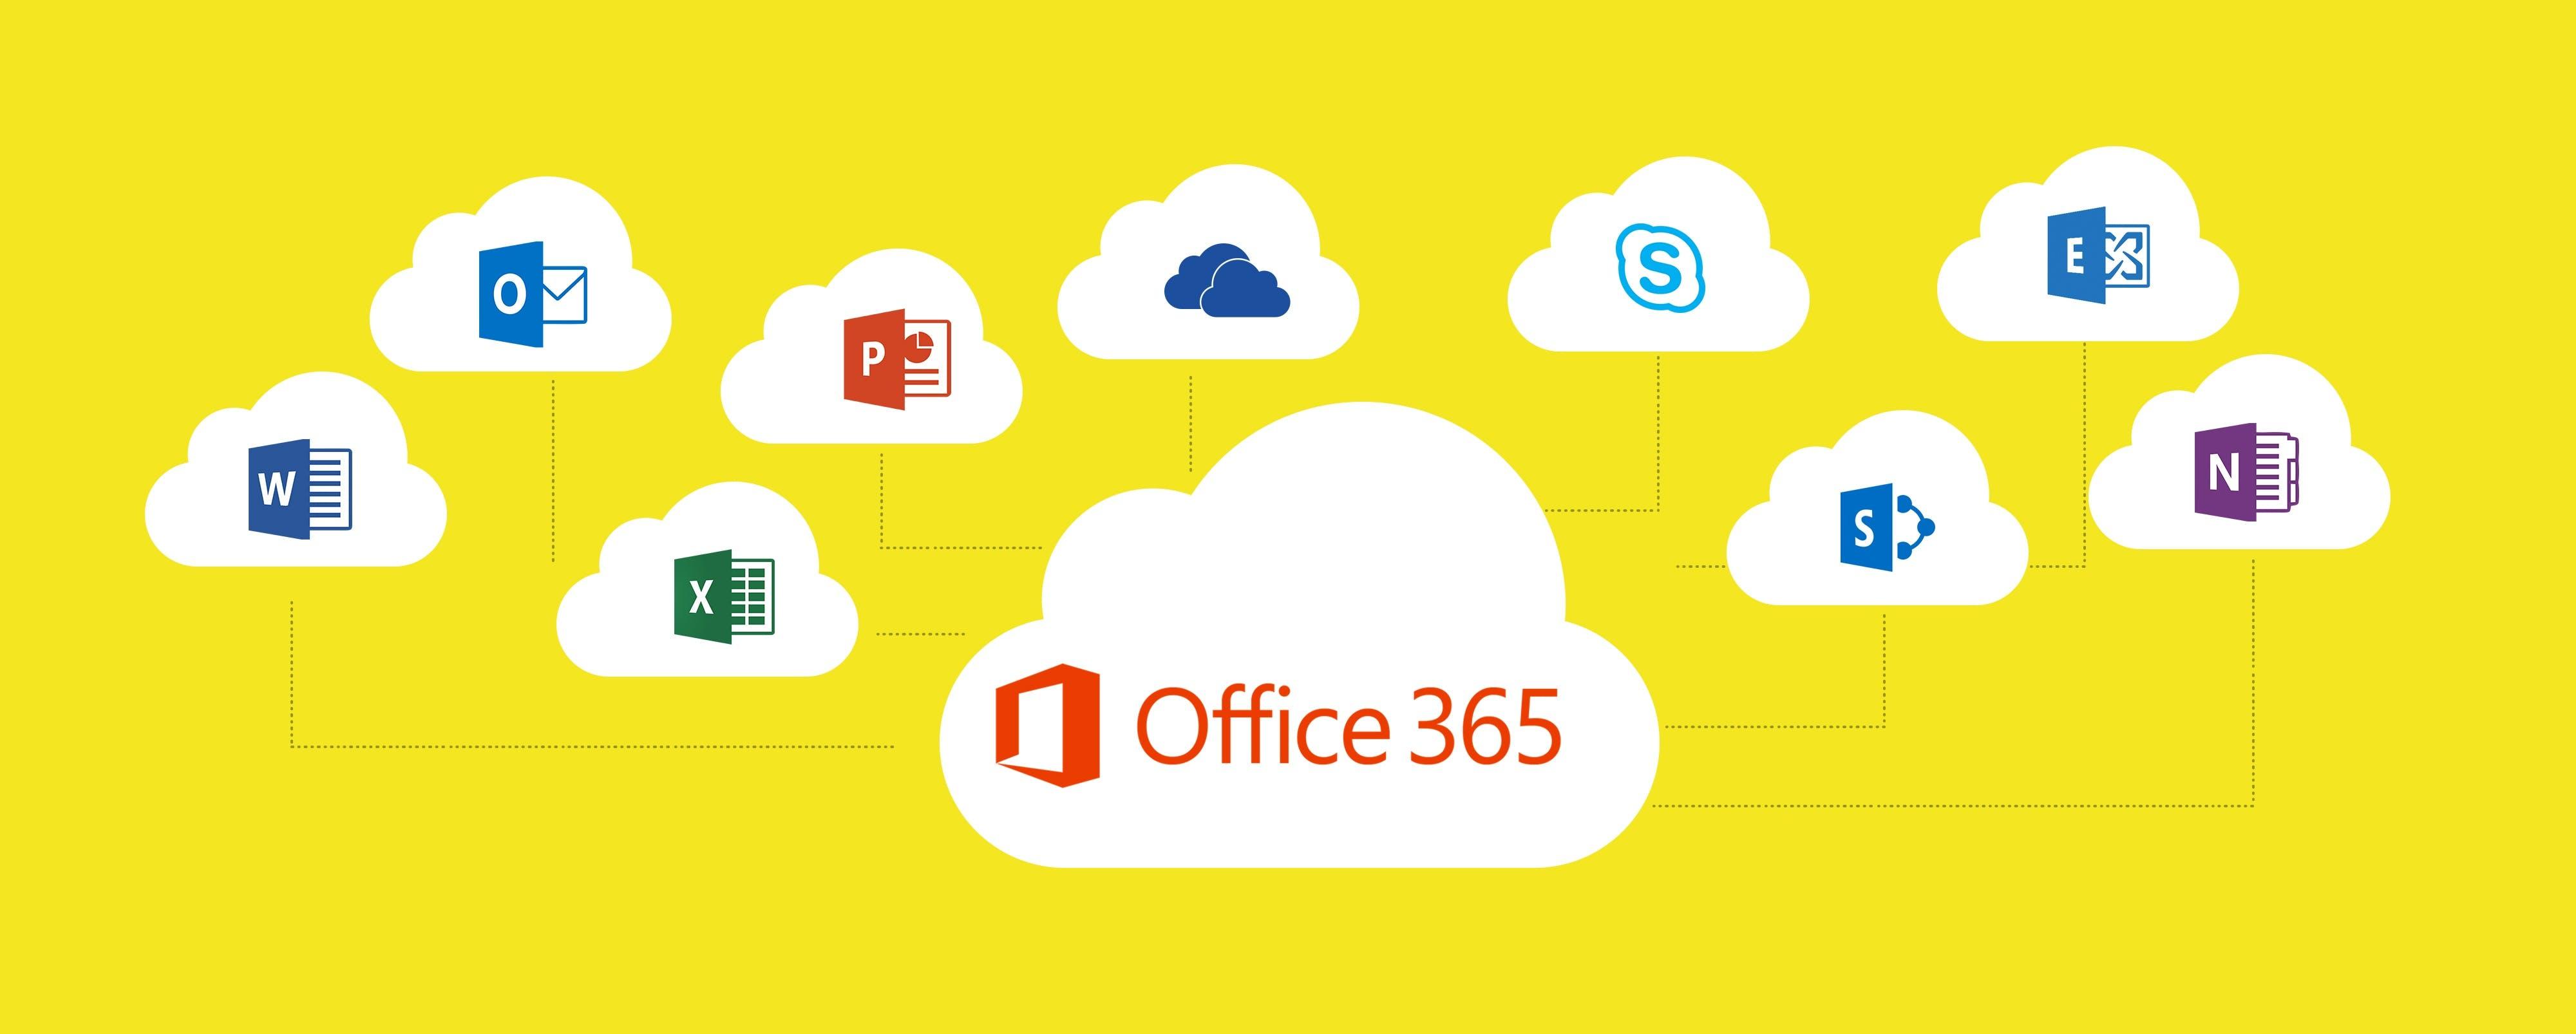 Titelbild-Microsoft-Office-365-Toolbar-nachgebaut